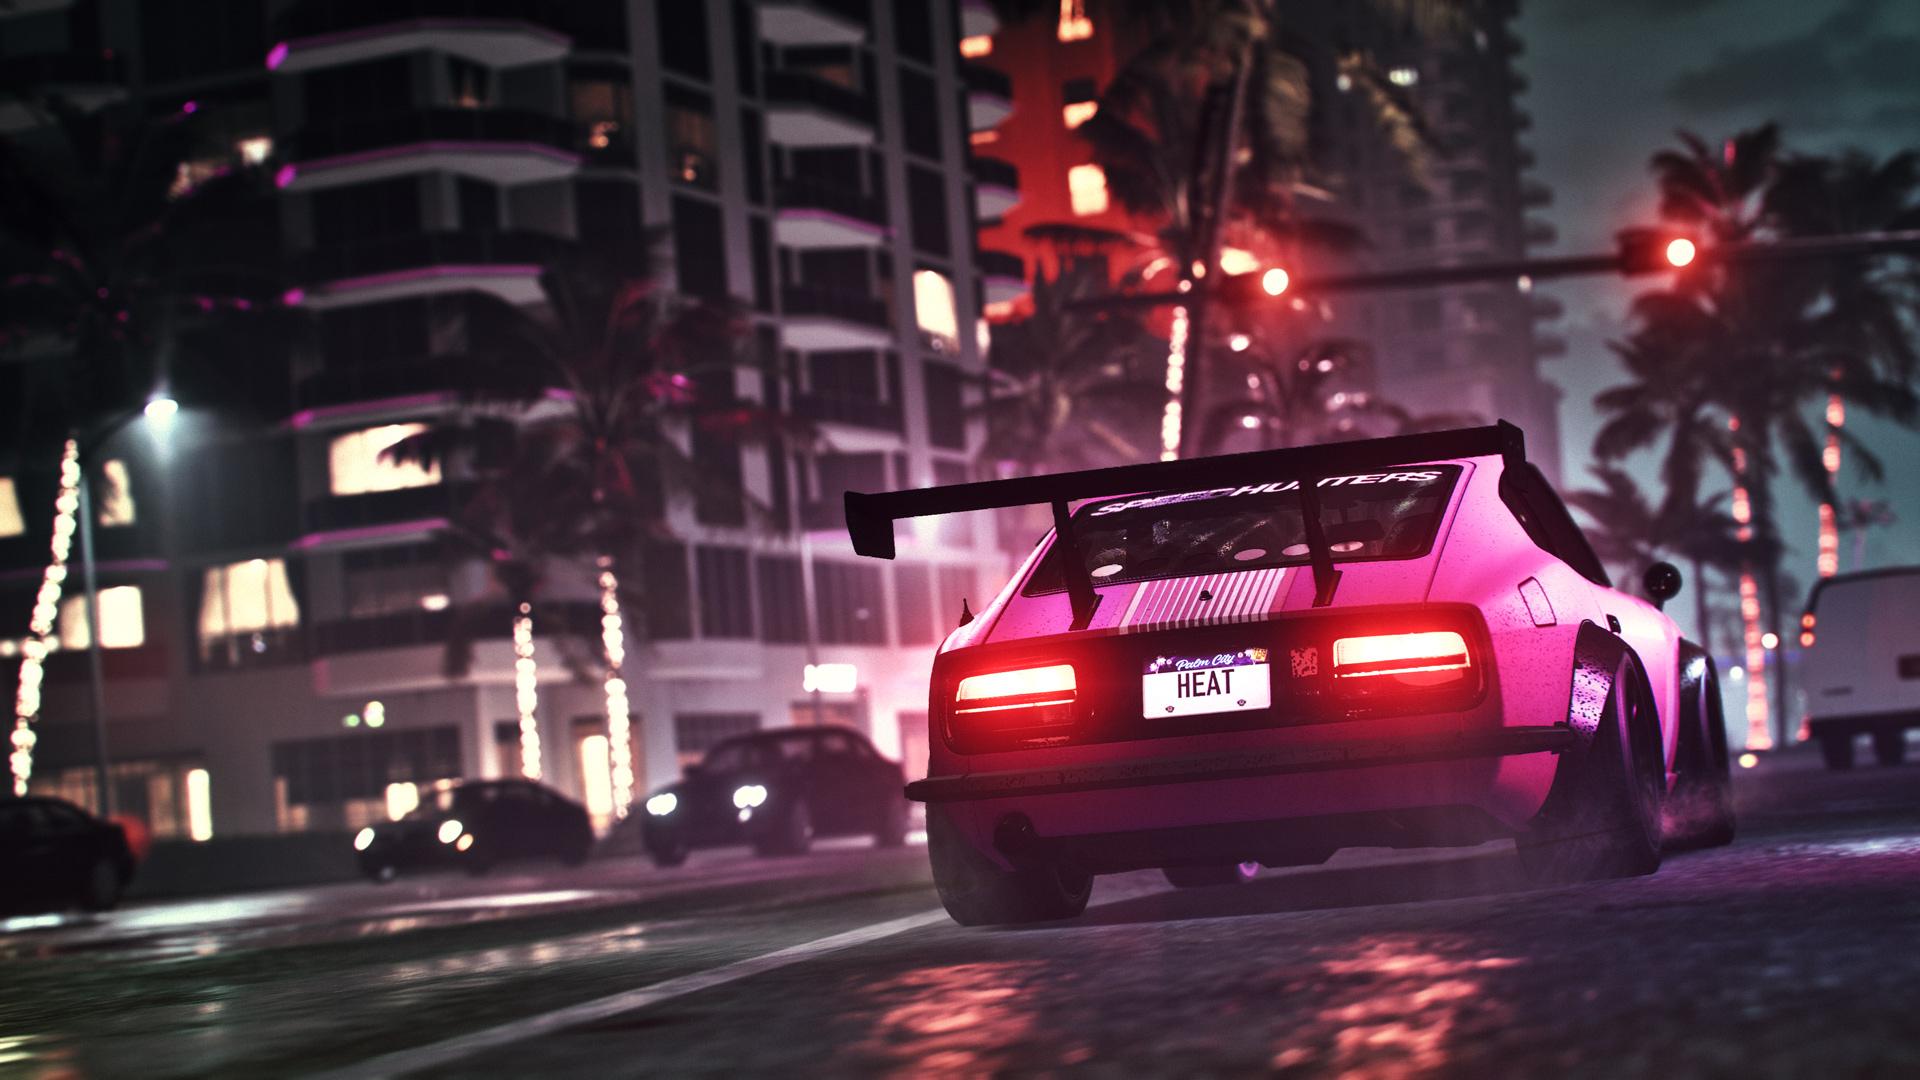 Need for Speed: Heat/June Update